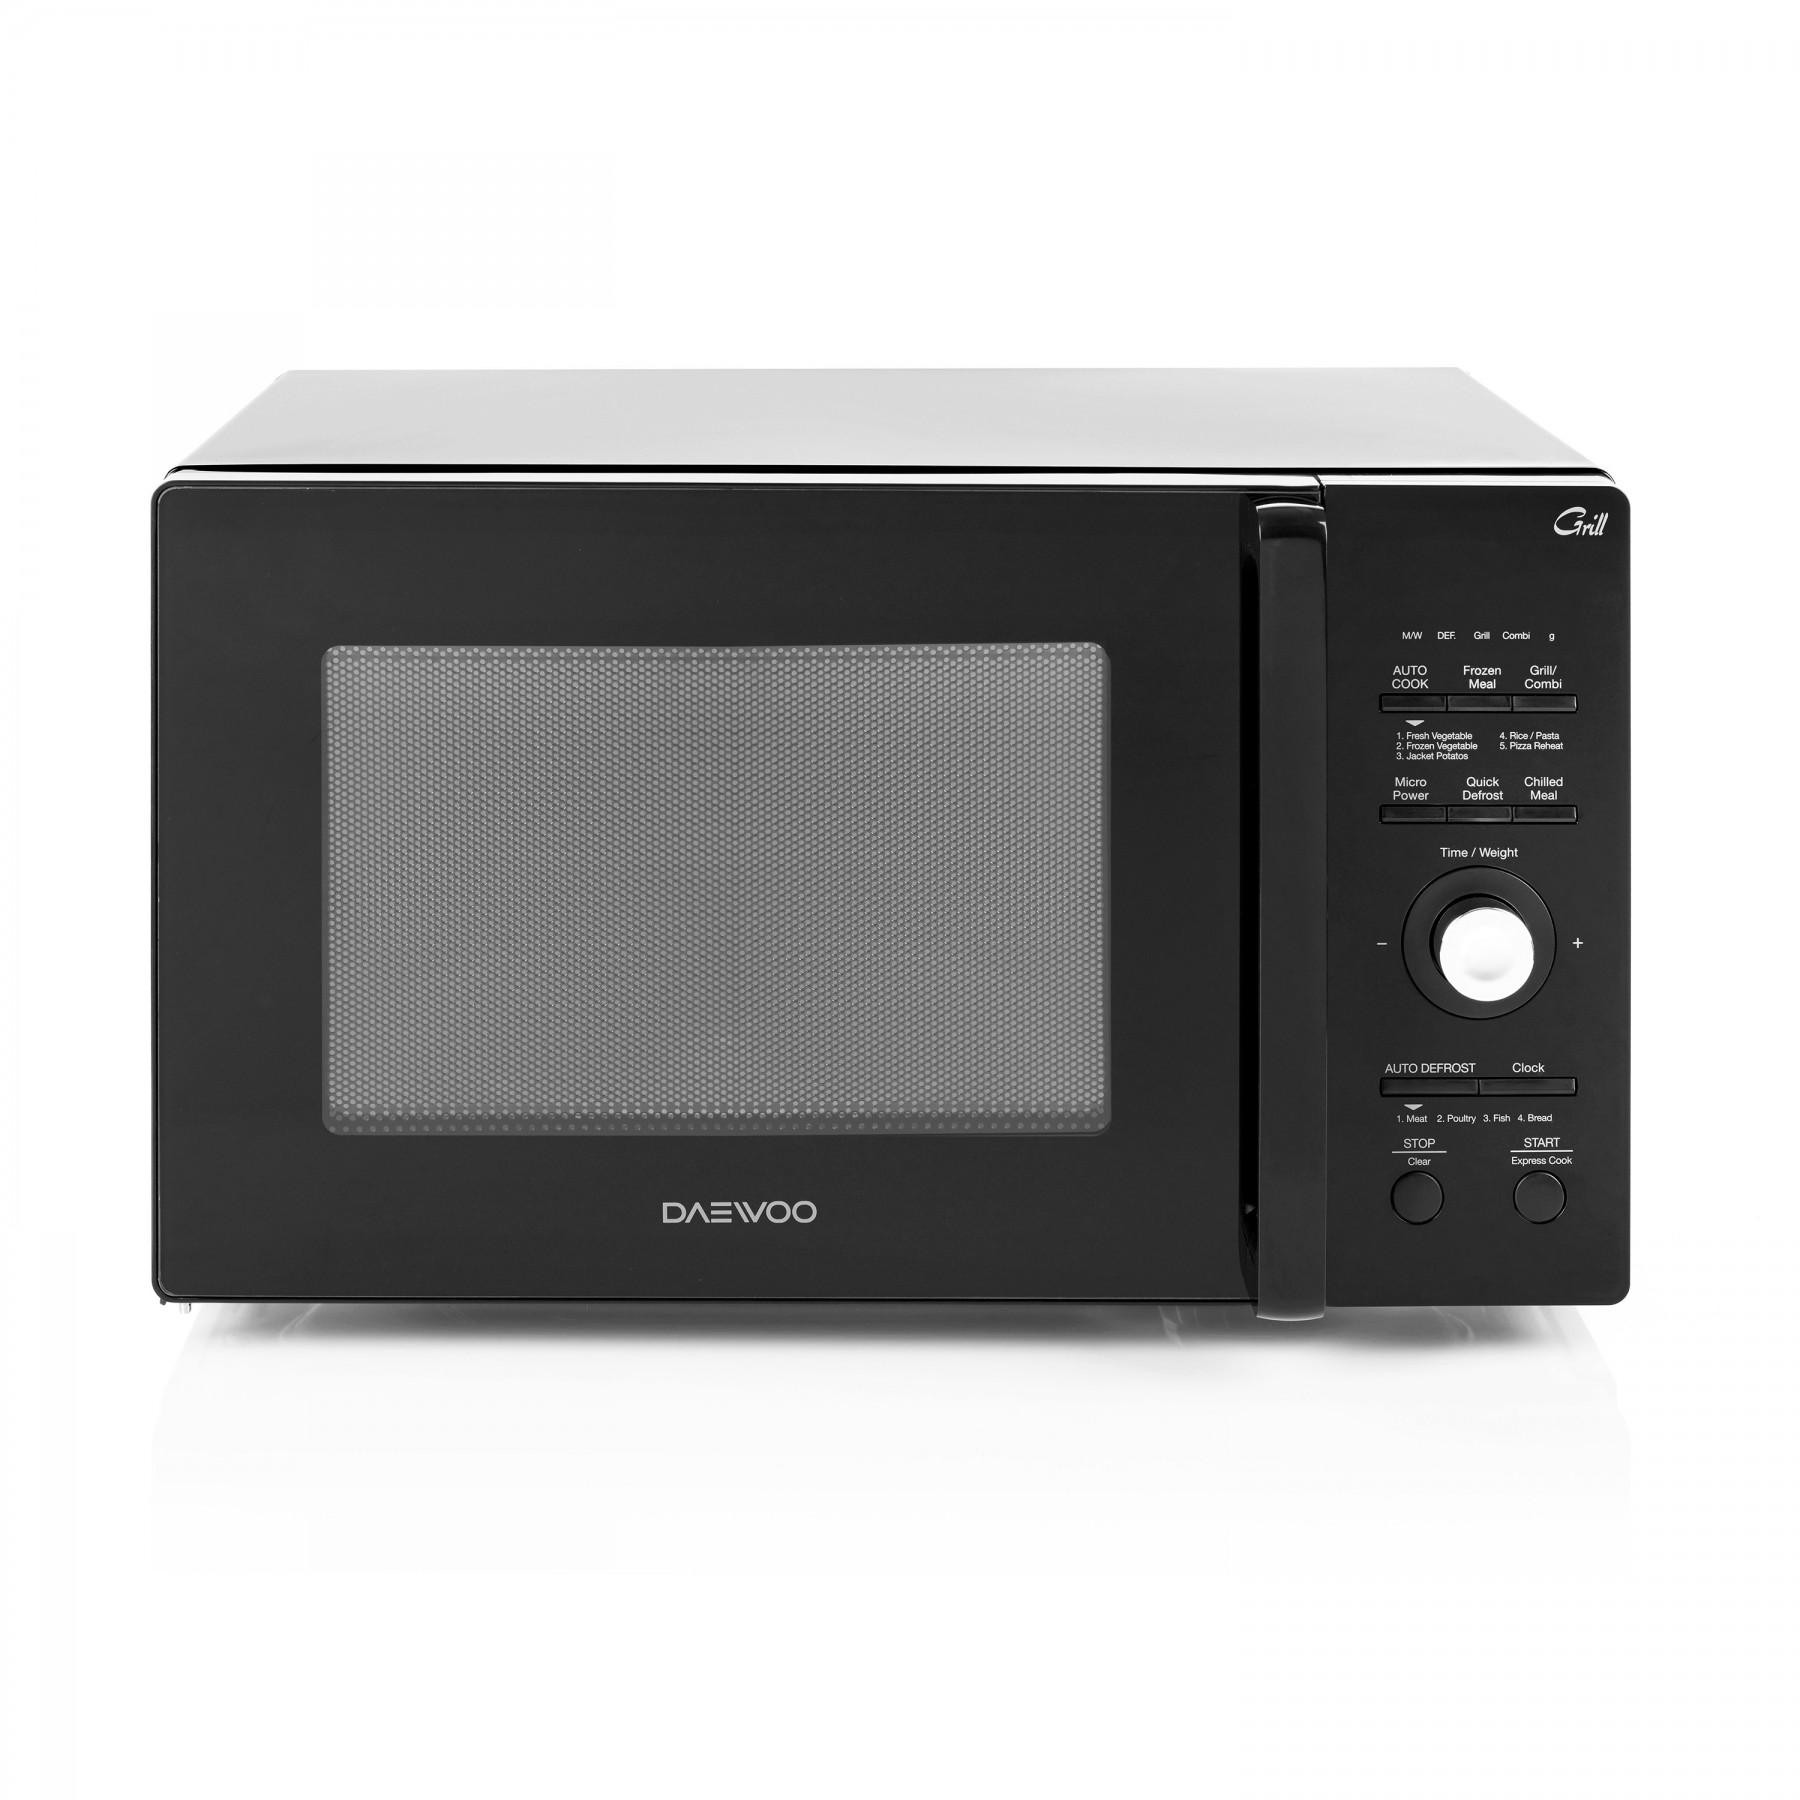 kog 8a8r digital microwave oven grill 23l daewoo electronics rh daewooelectronics eu Daewoo Mini Fridge Daewoo Retro Fridge Inside